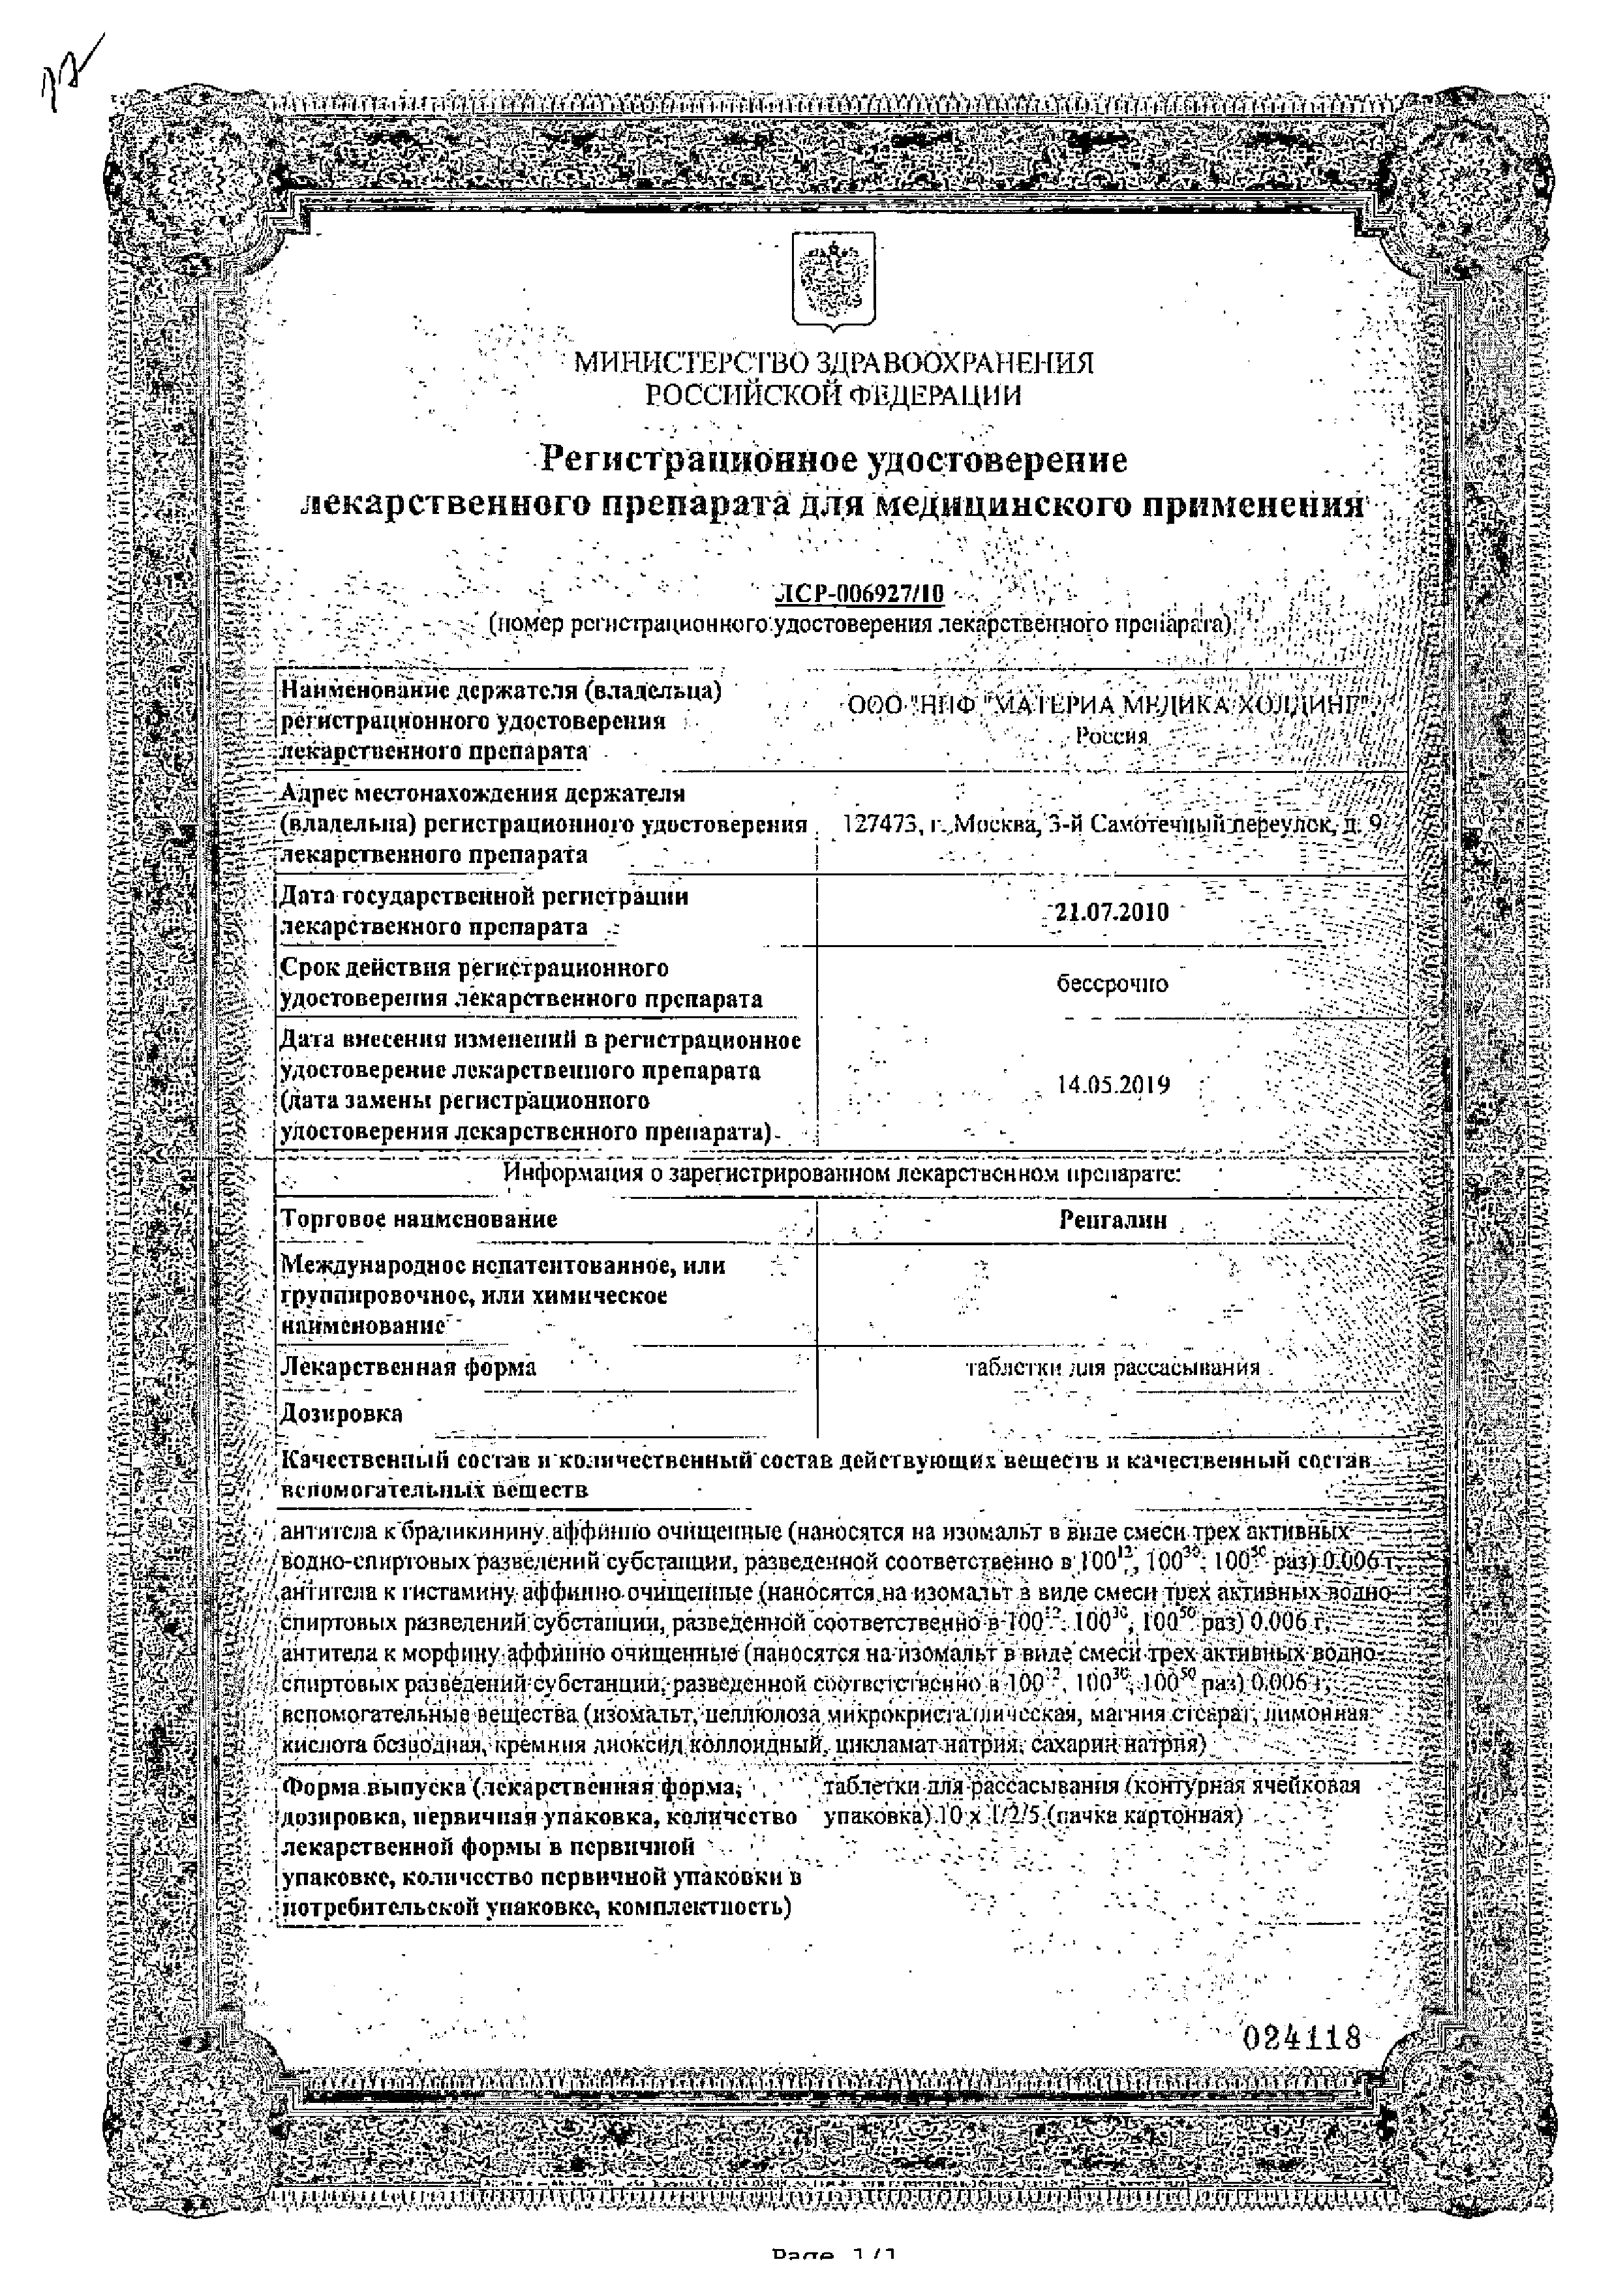 Ренгалин сертификат